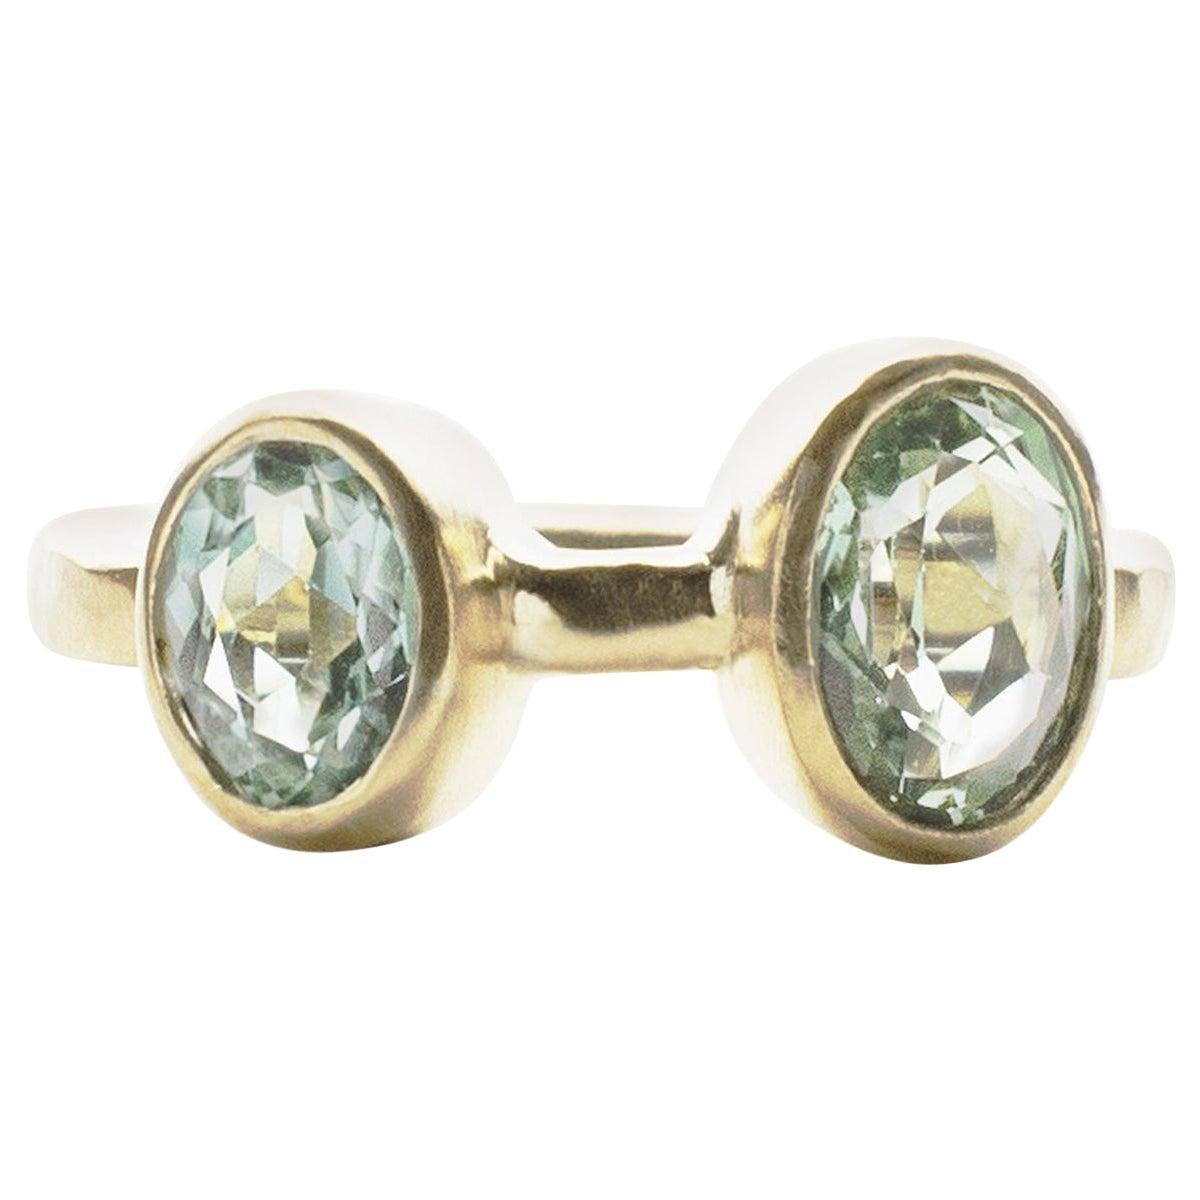 Deborah Murdoch 18 Karat Yellow Gold Blue Green Tourmaline Cocktail Ring